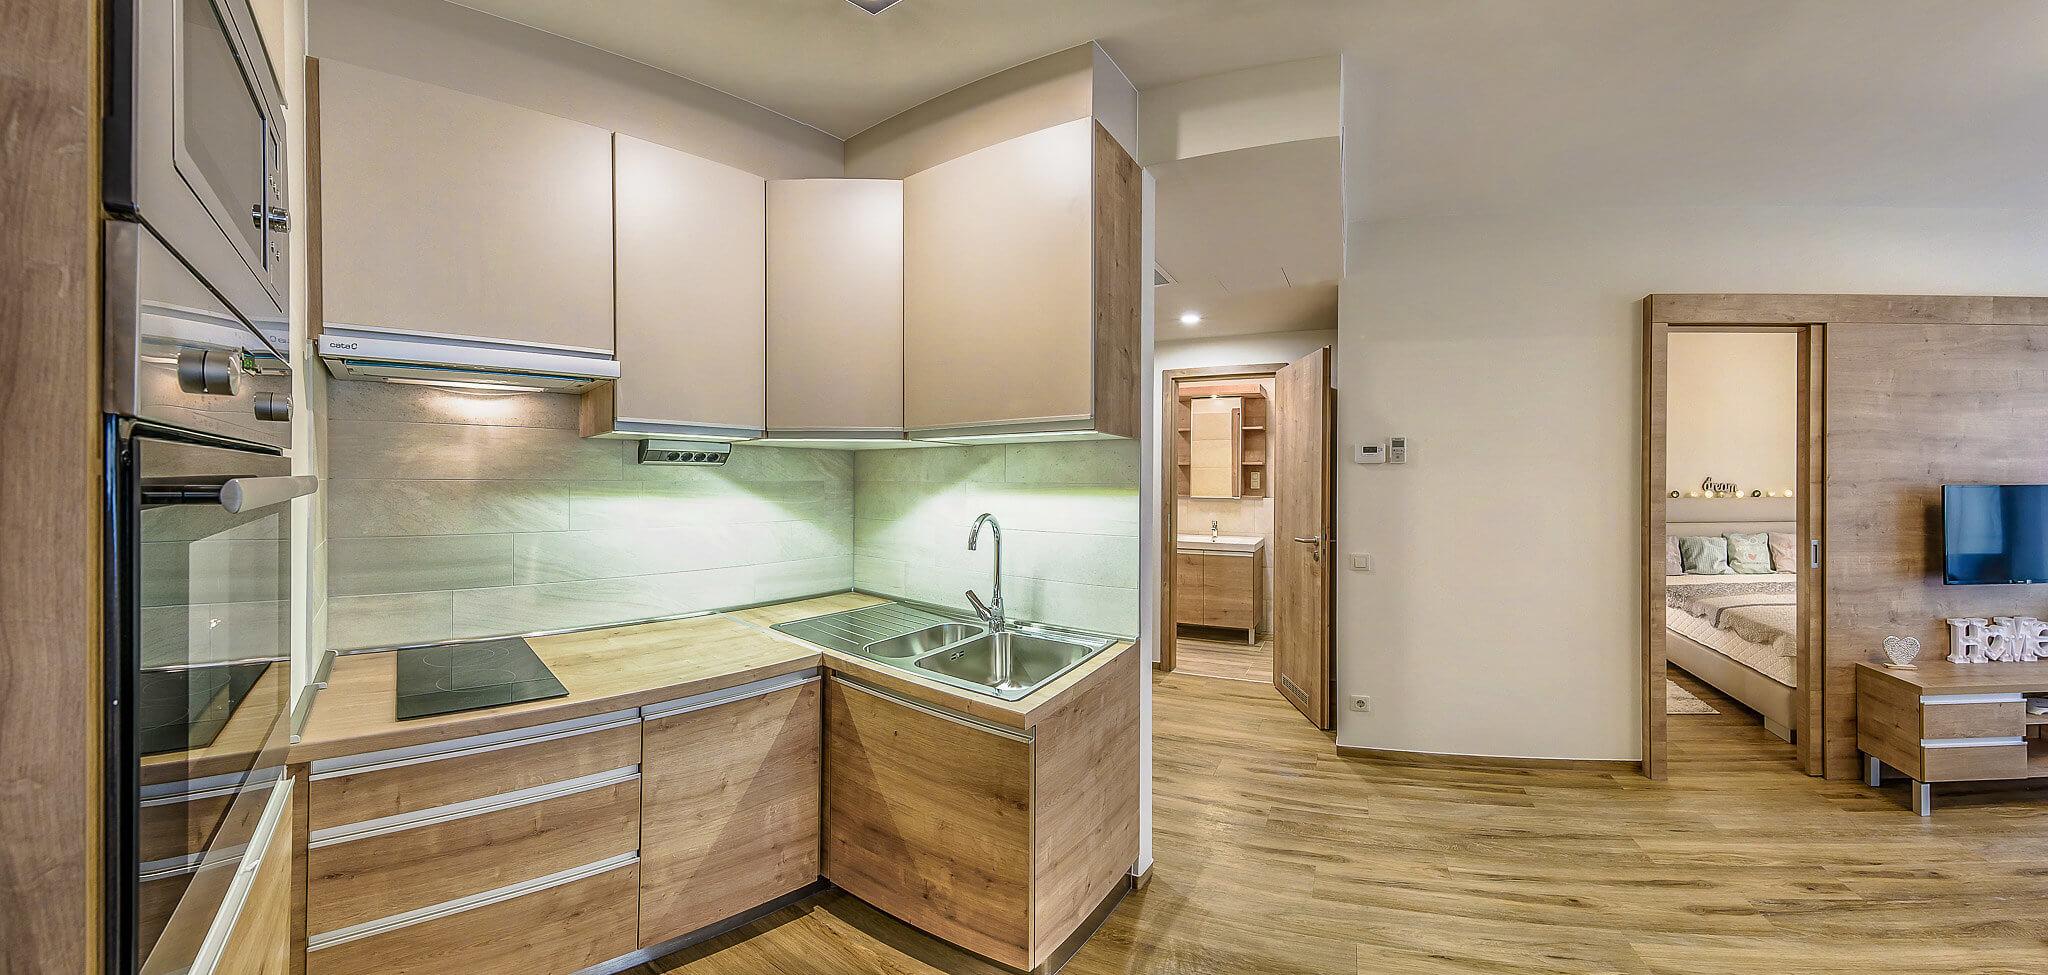 One bedroom Standard 5 - Art Homes Budapest